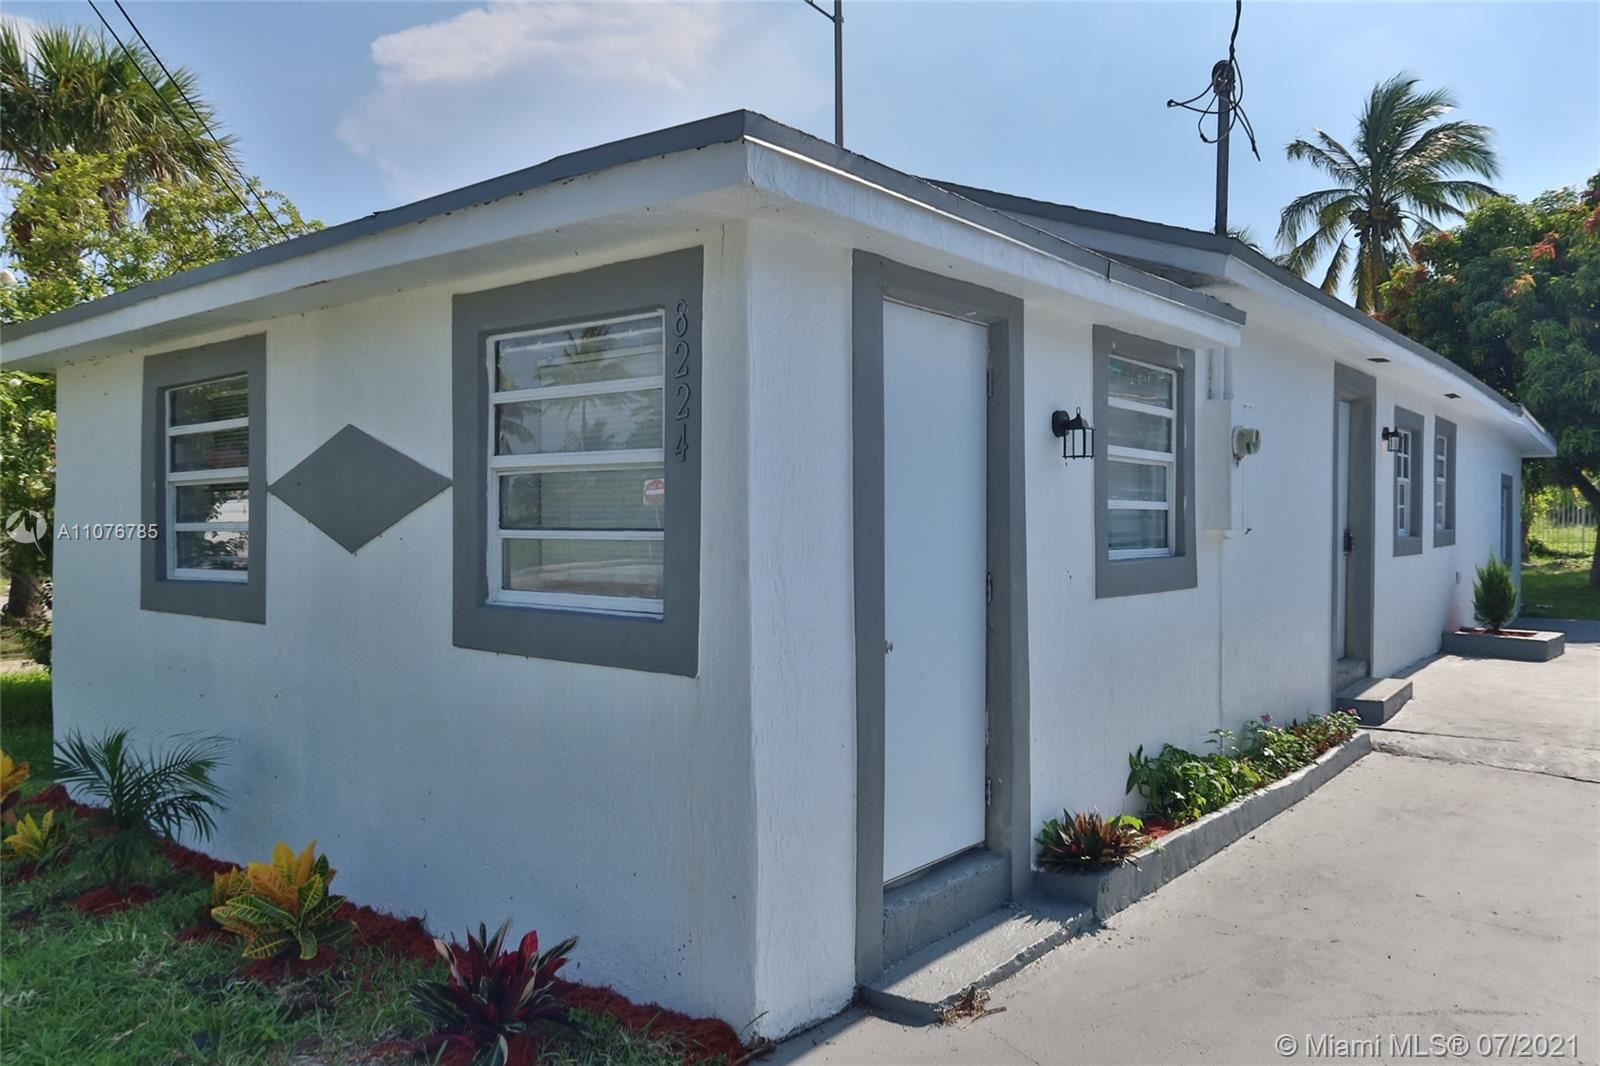 8224 NW 1st Pl, Miami, FL 33150 - #: A11076785